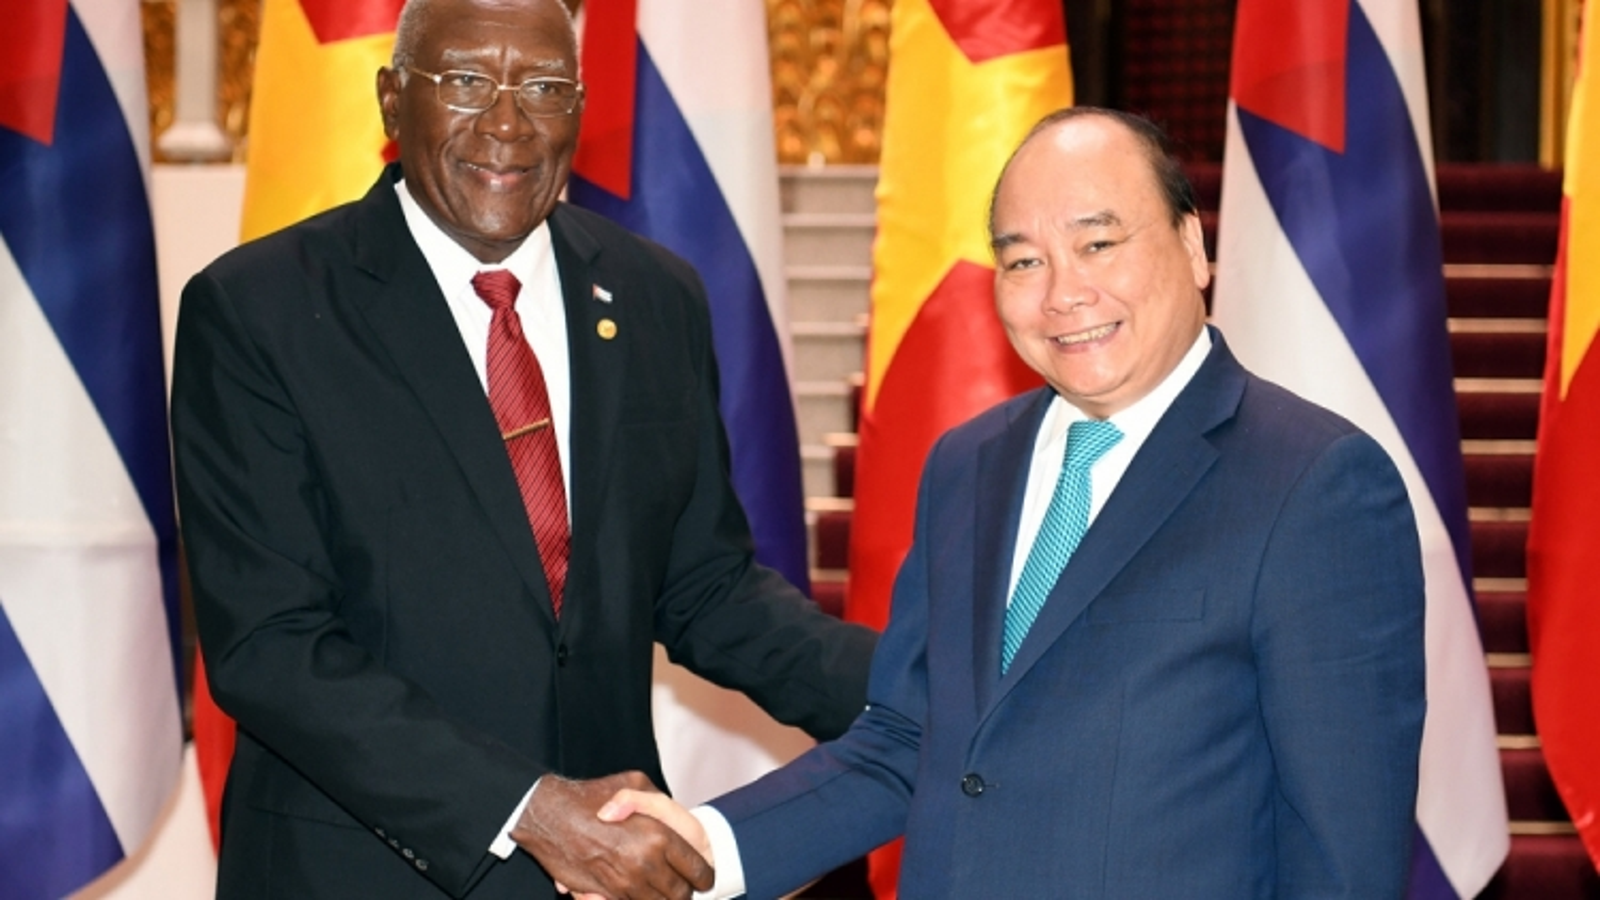 Vietnam, Cuba show exemplary solidarity in international relations